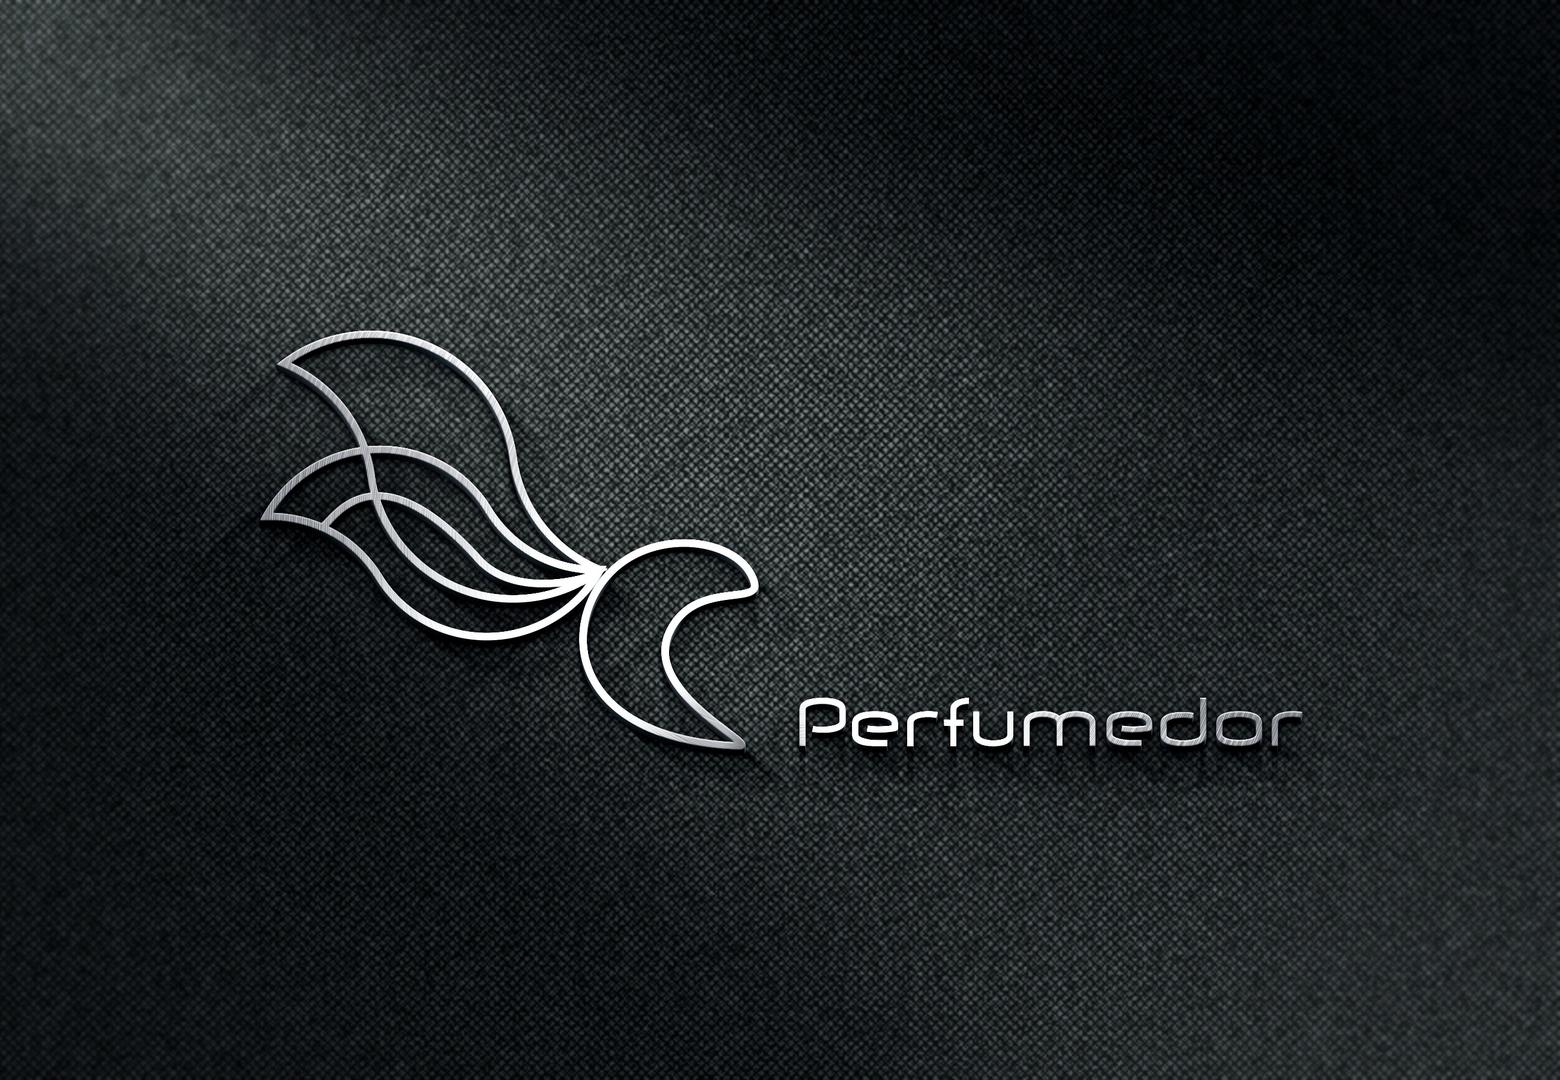 Логотип для интернет-магазина парфюмерии фото f_1975b47000bab65d.jpg